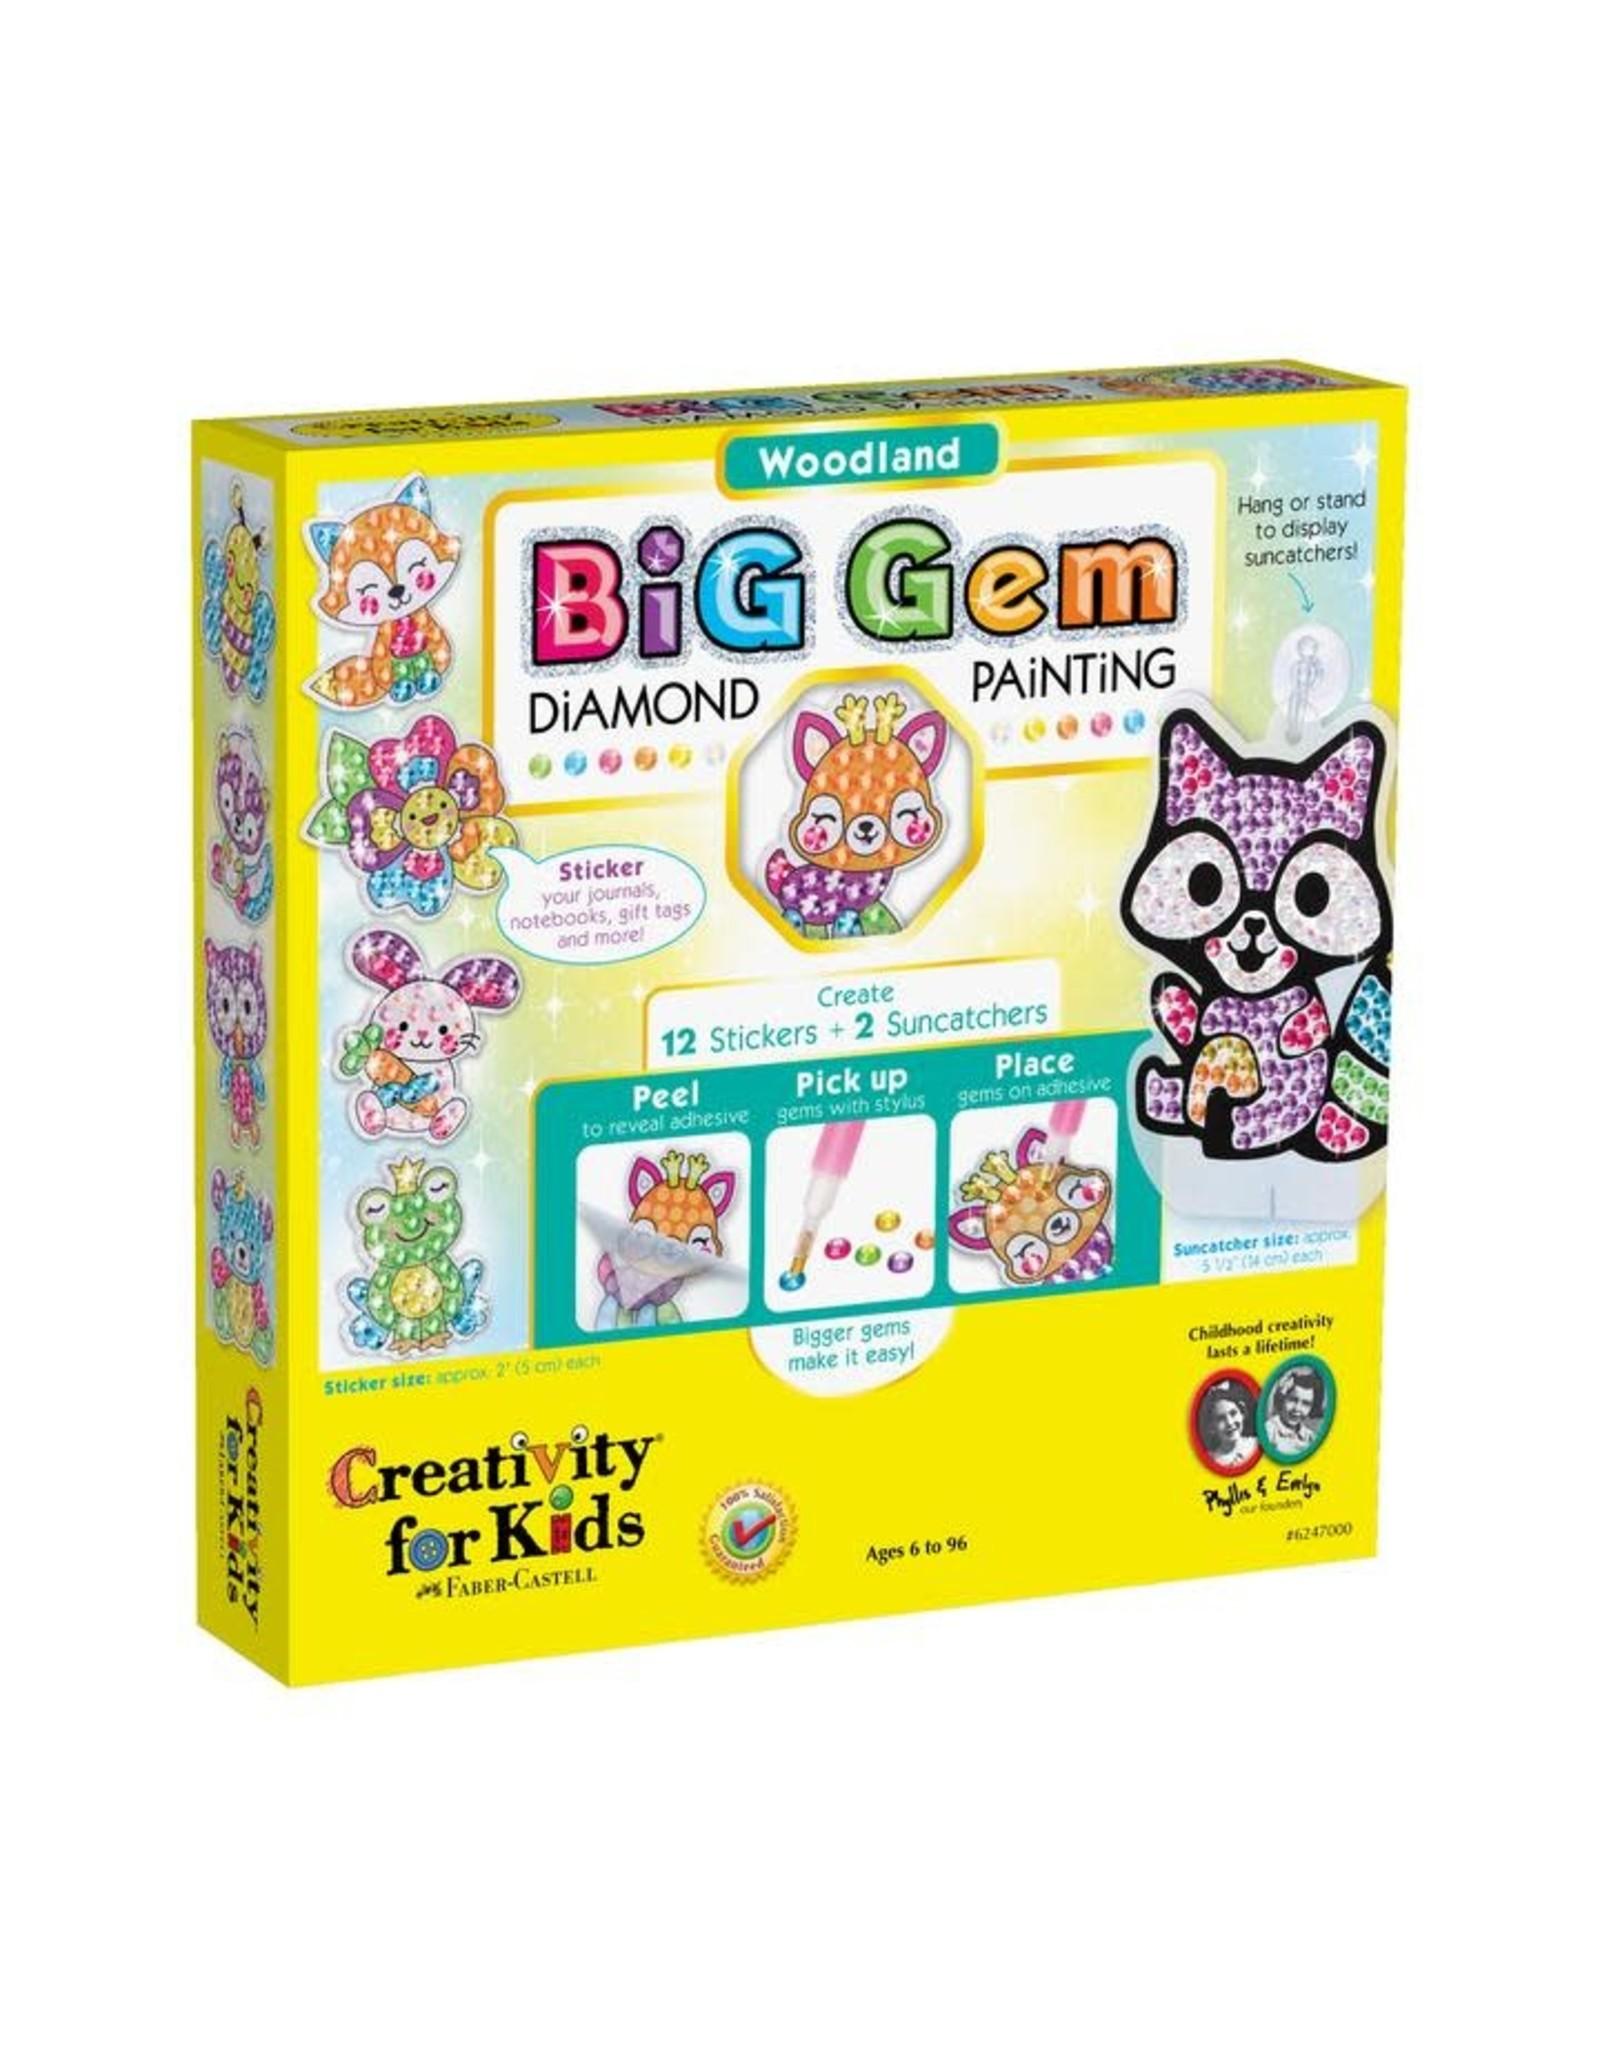 Creativity For Kids Big Gem Diamond Painting Woodland